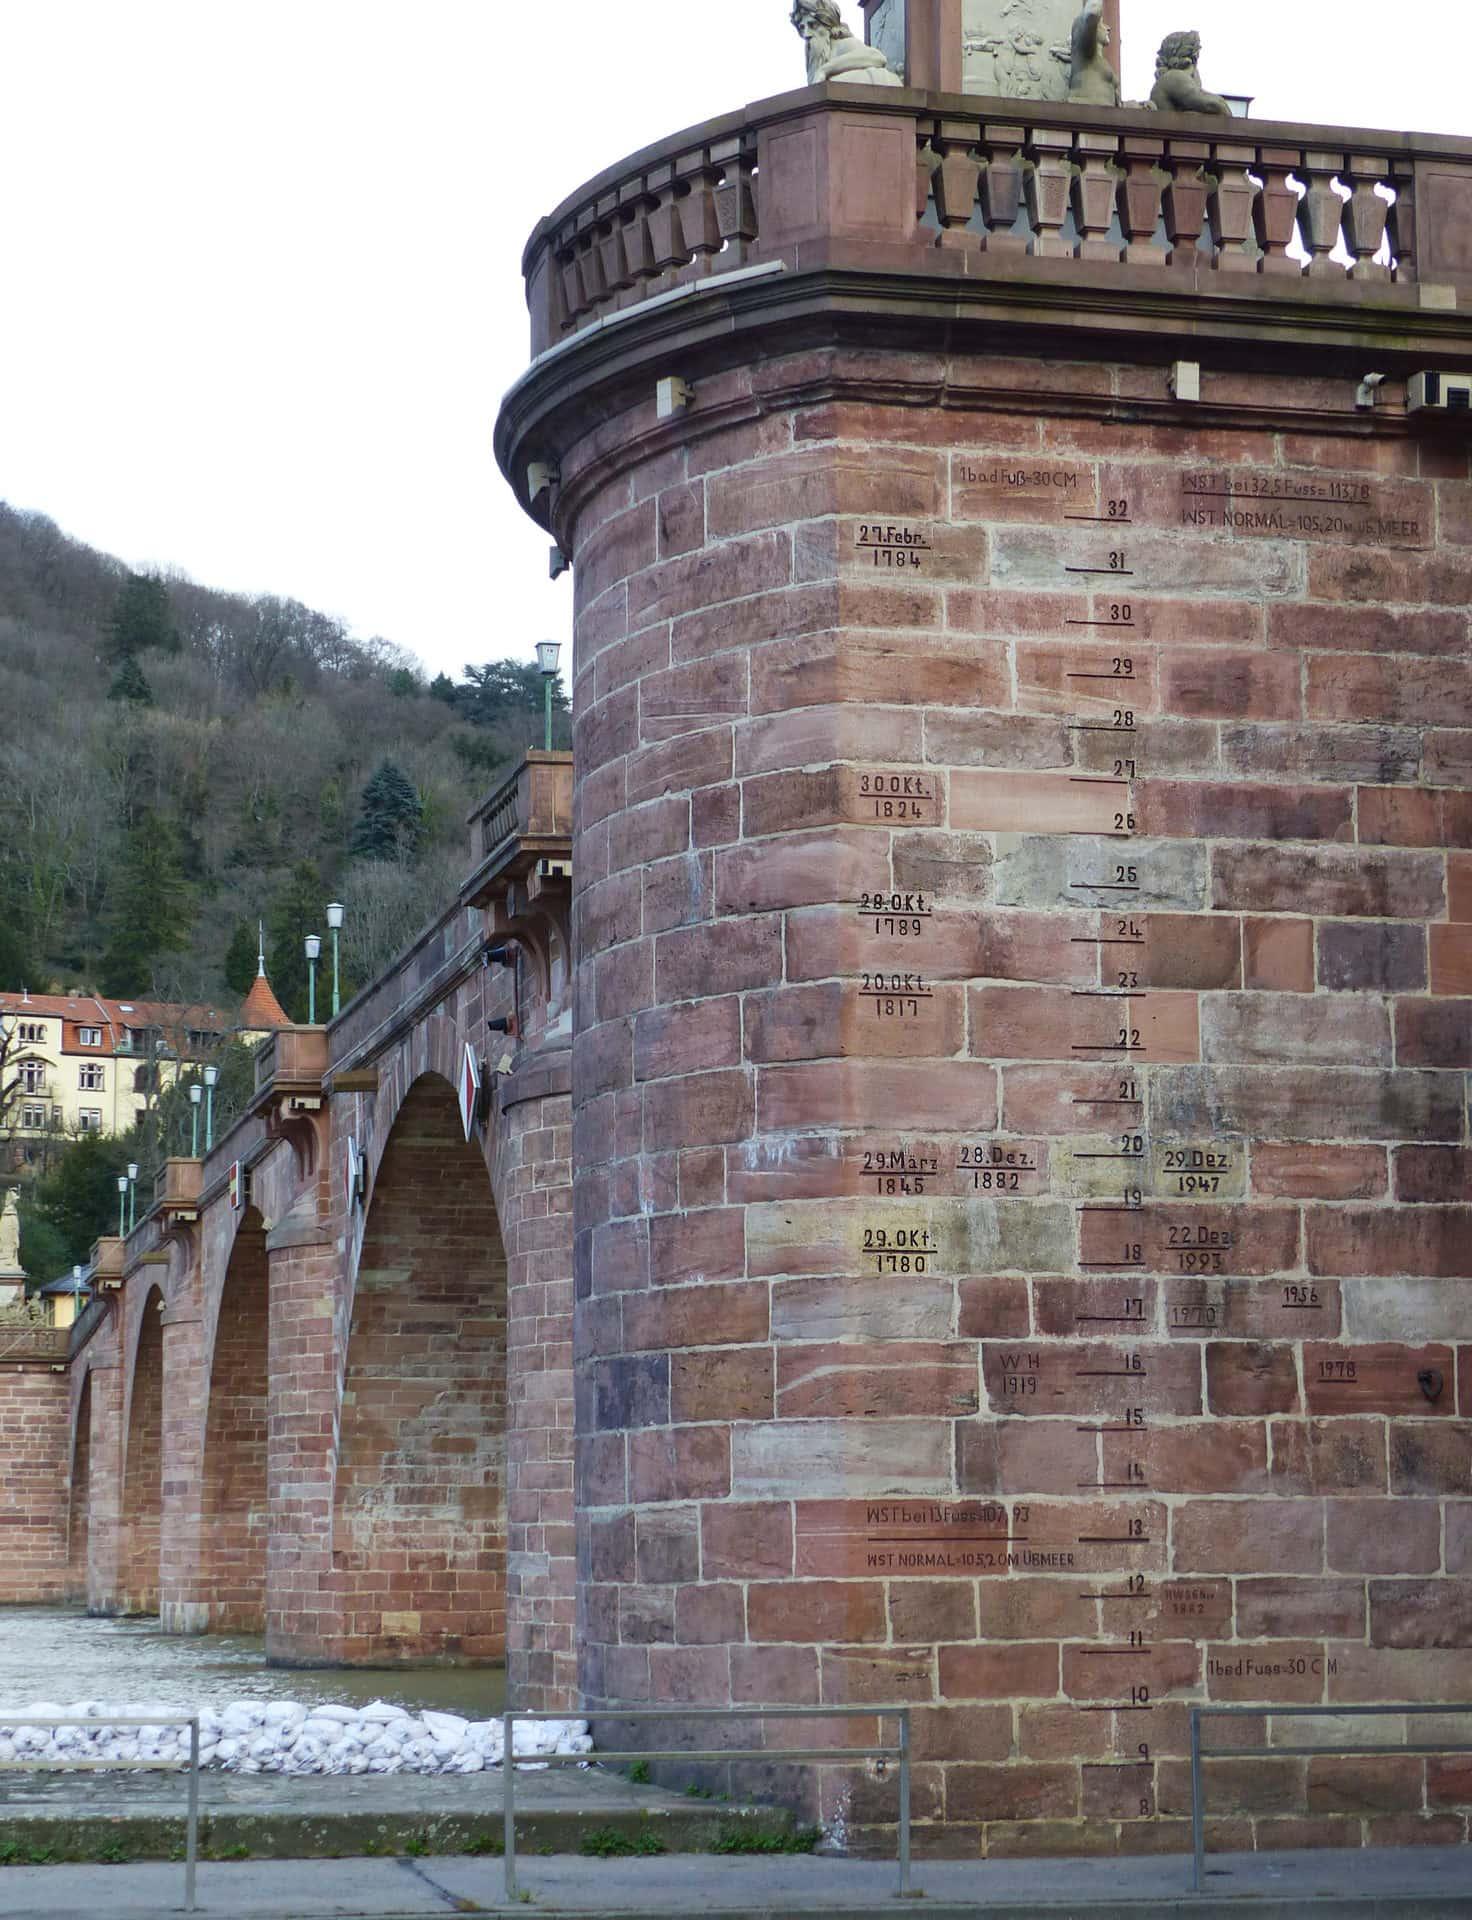 Alte Brucke Heidelberg Heidelberg Guide